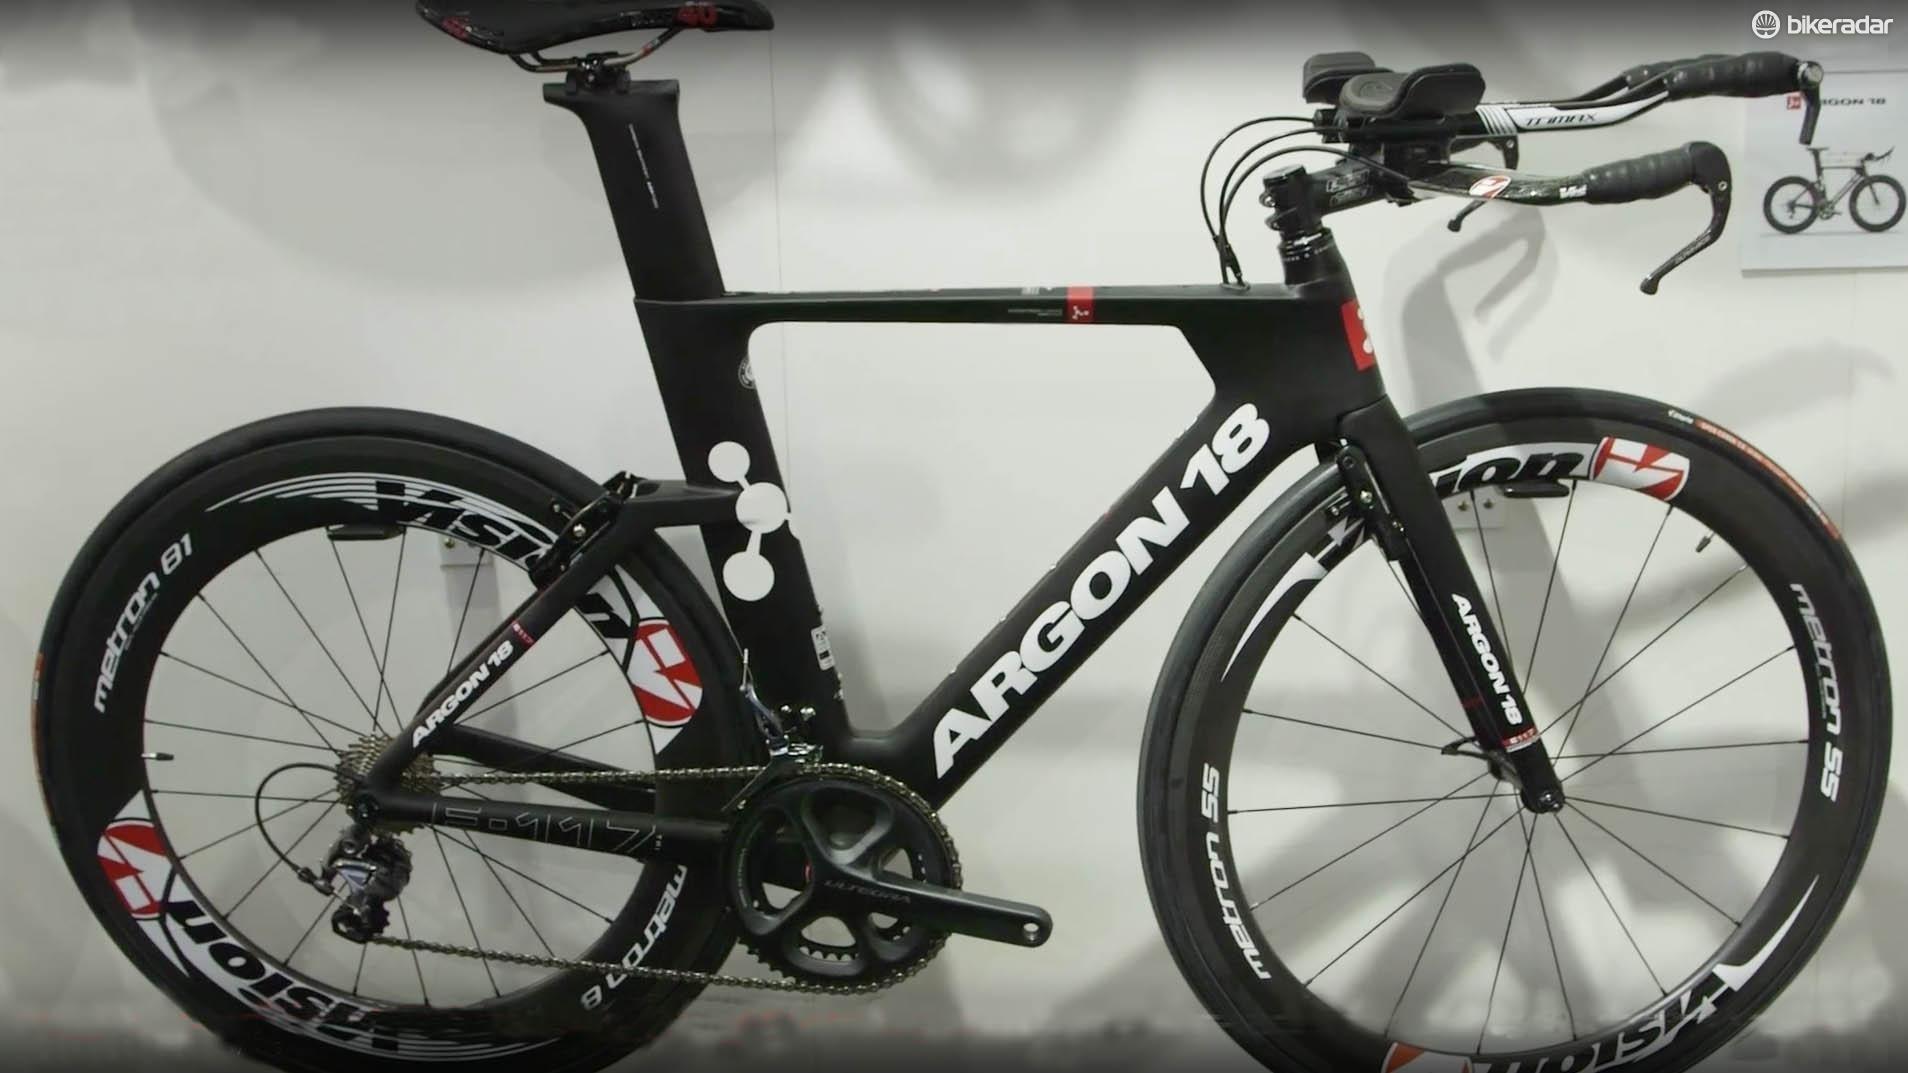 The Argon 18 E119 Tri is the top-of-the-range bike in the brand's new triathlon range